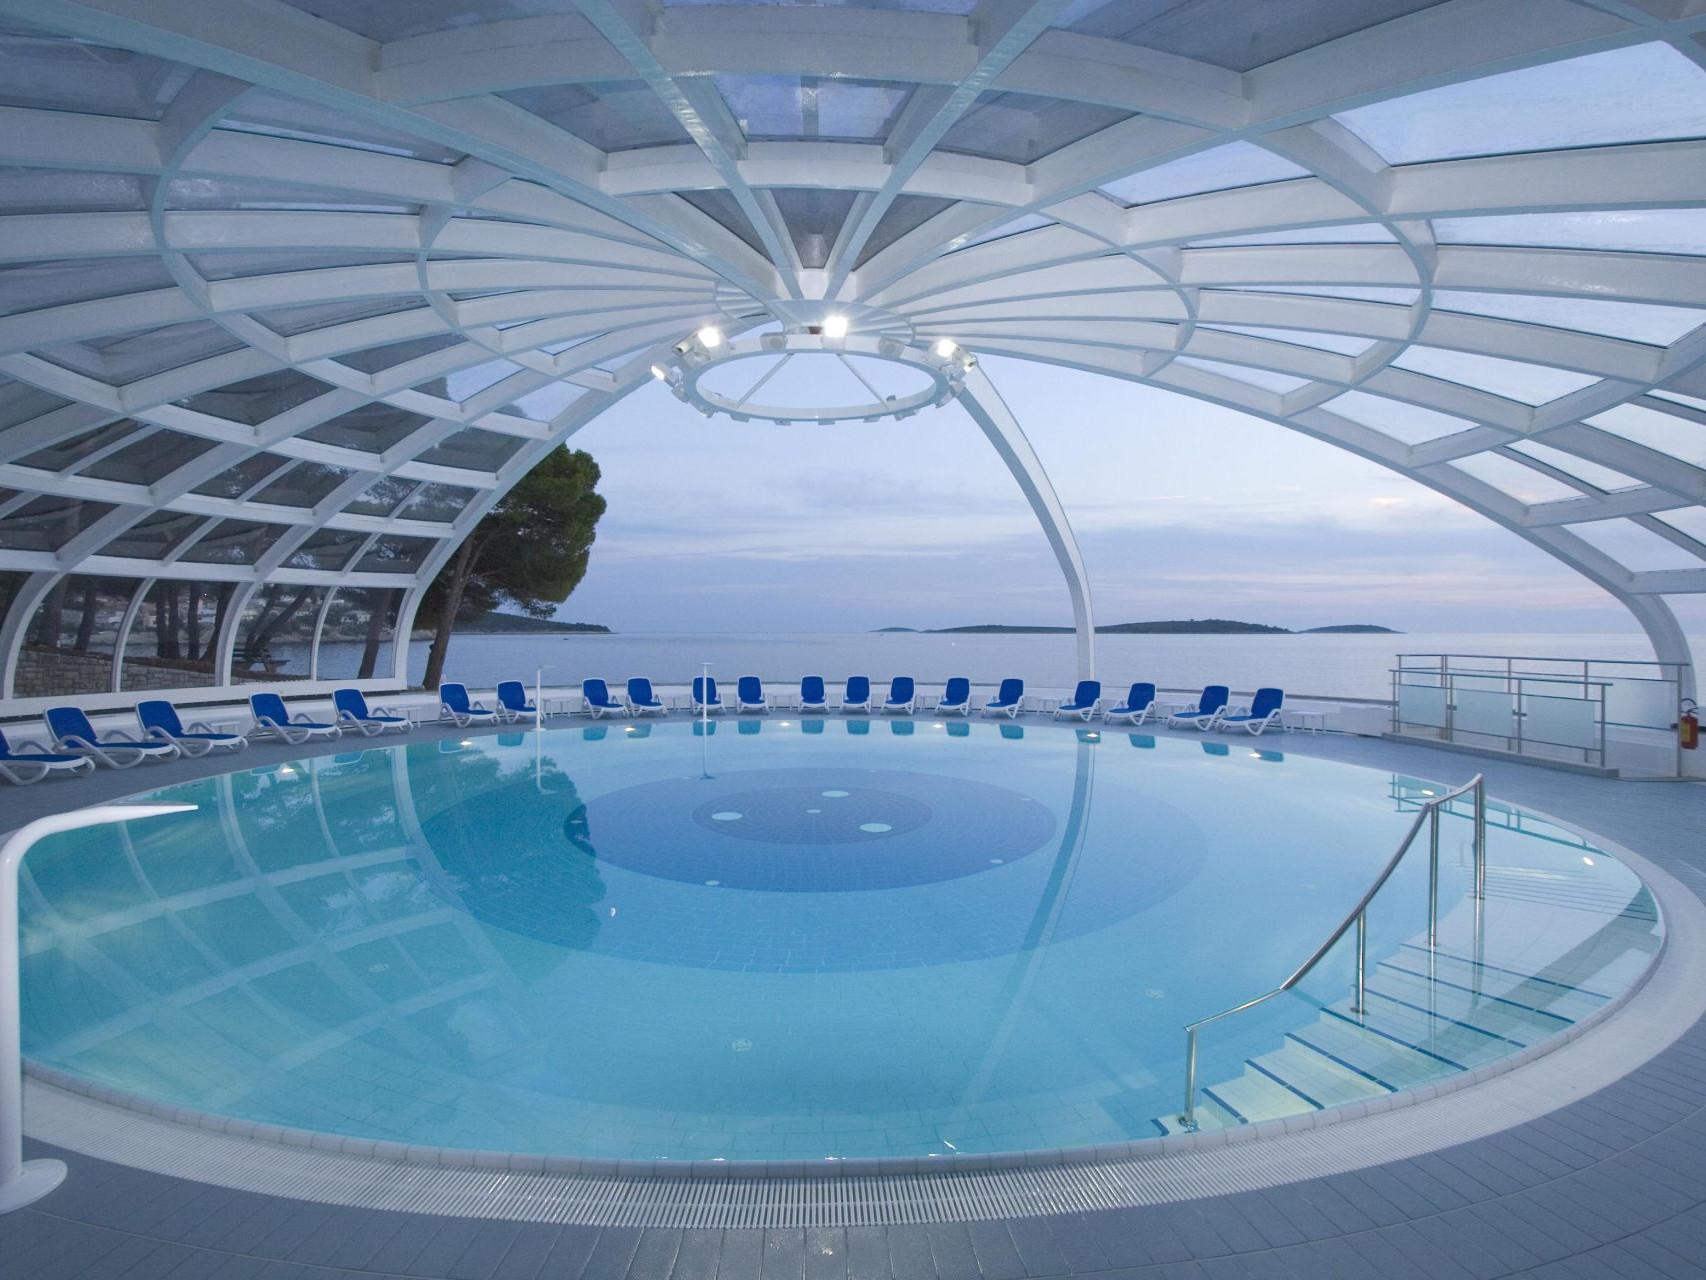 swimming pool 14 14802853606 o 1 uai - Zora Hotel